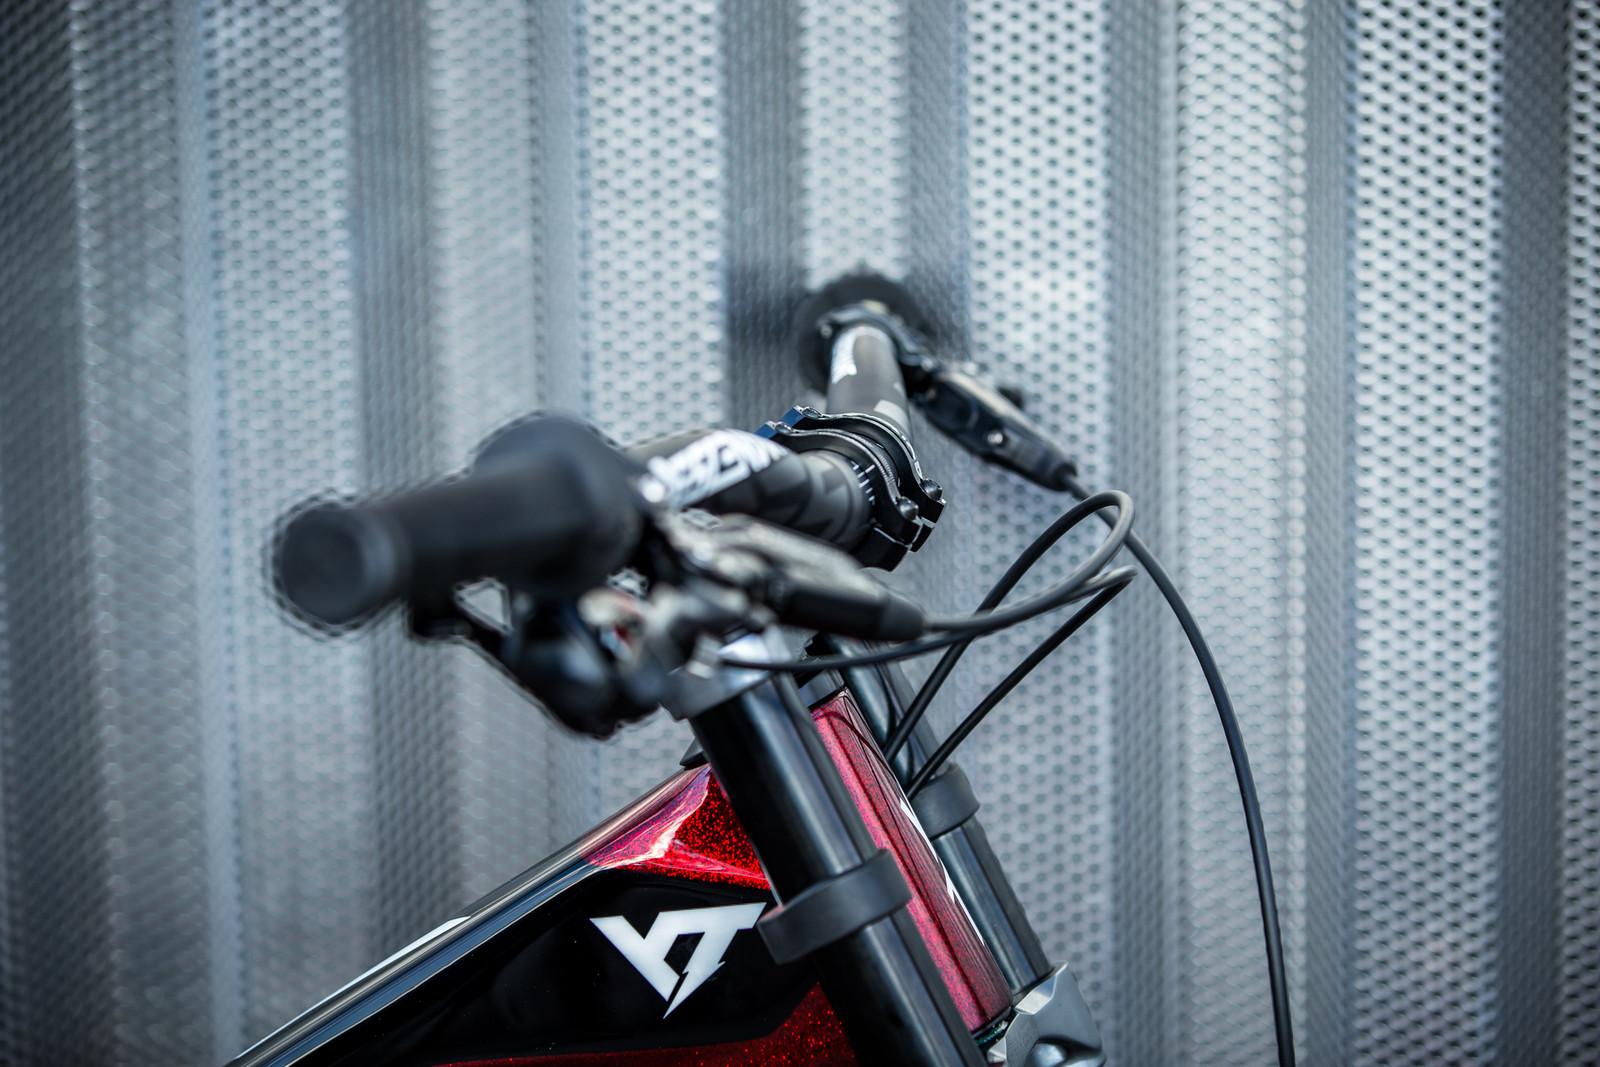 Descendant DM Stem - WORLD CHAMPS BIKES - Erik Irmisch's YT TUES - Mountain Biking Pictures - Vital MTB